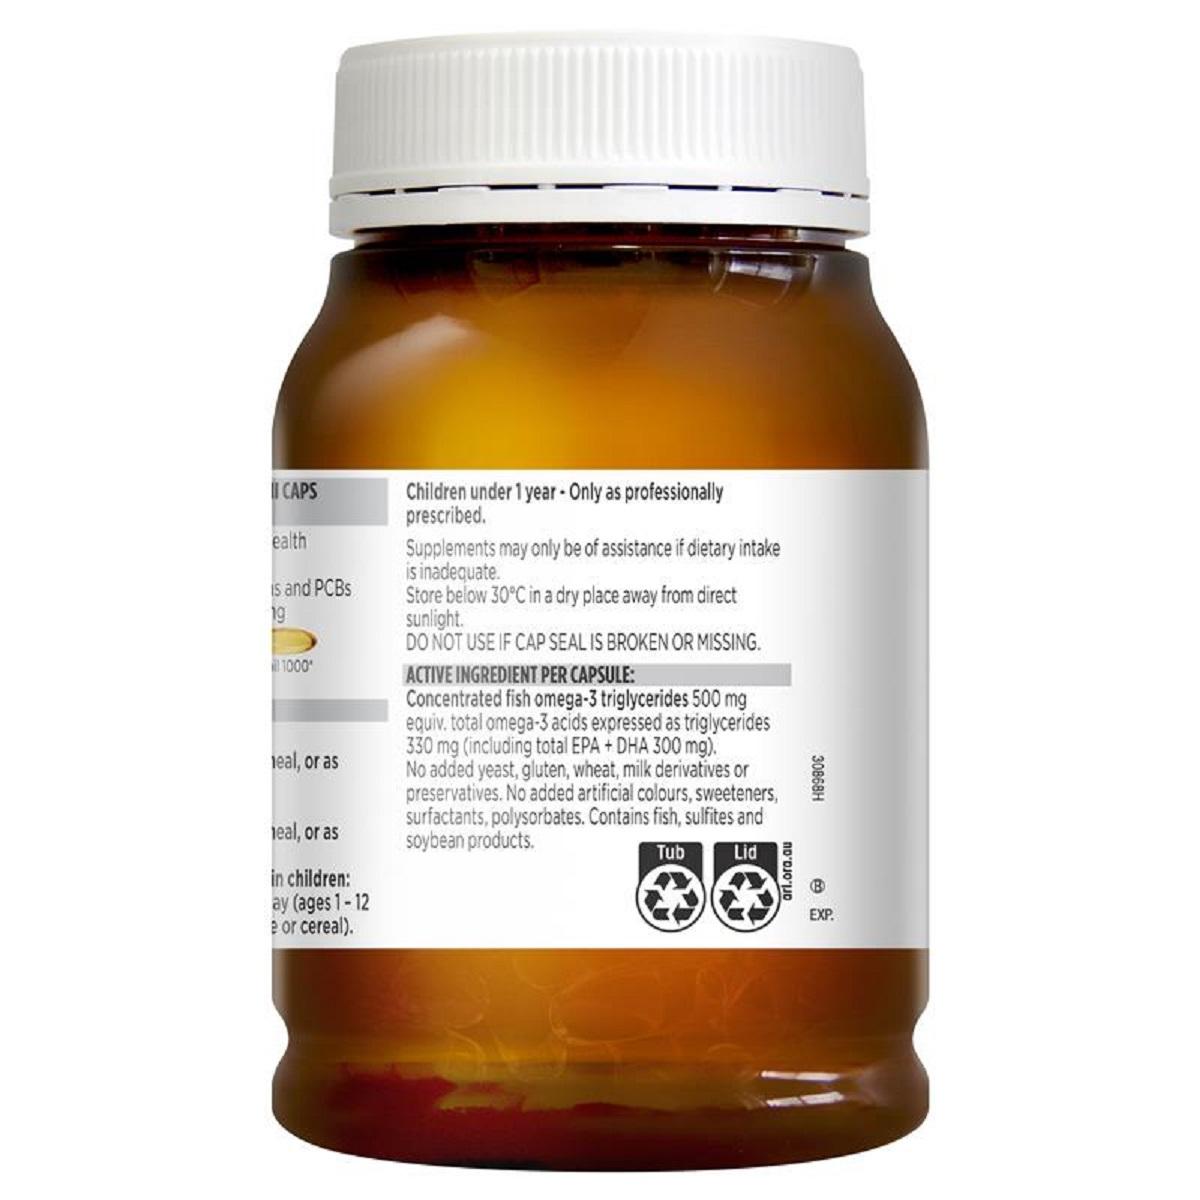 Blackmores-Odourless-Fish-Oil-400-Mini-Capsules-1